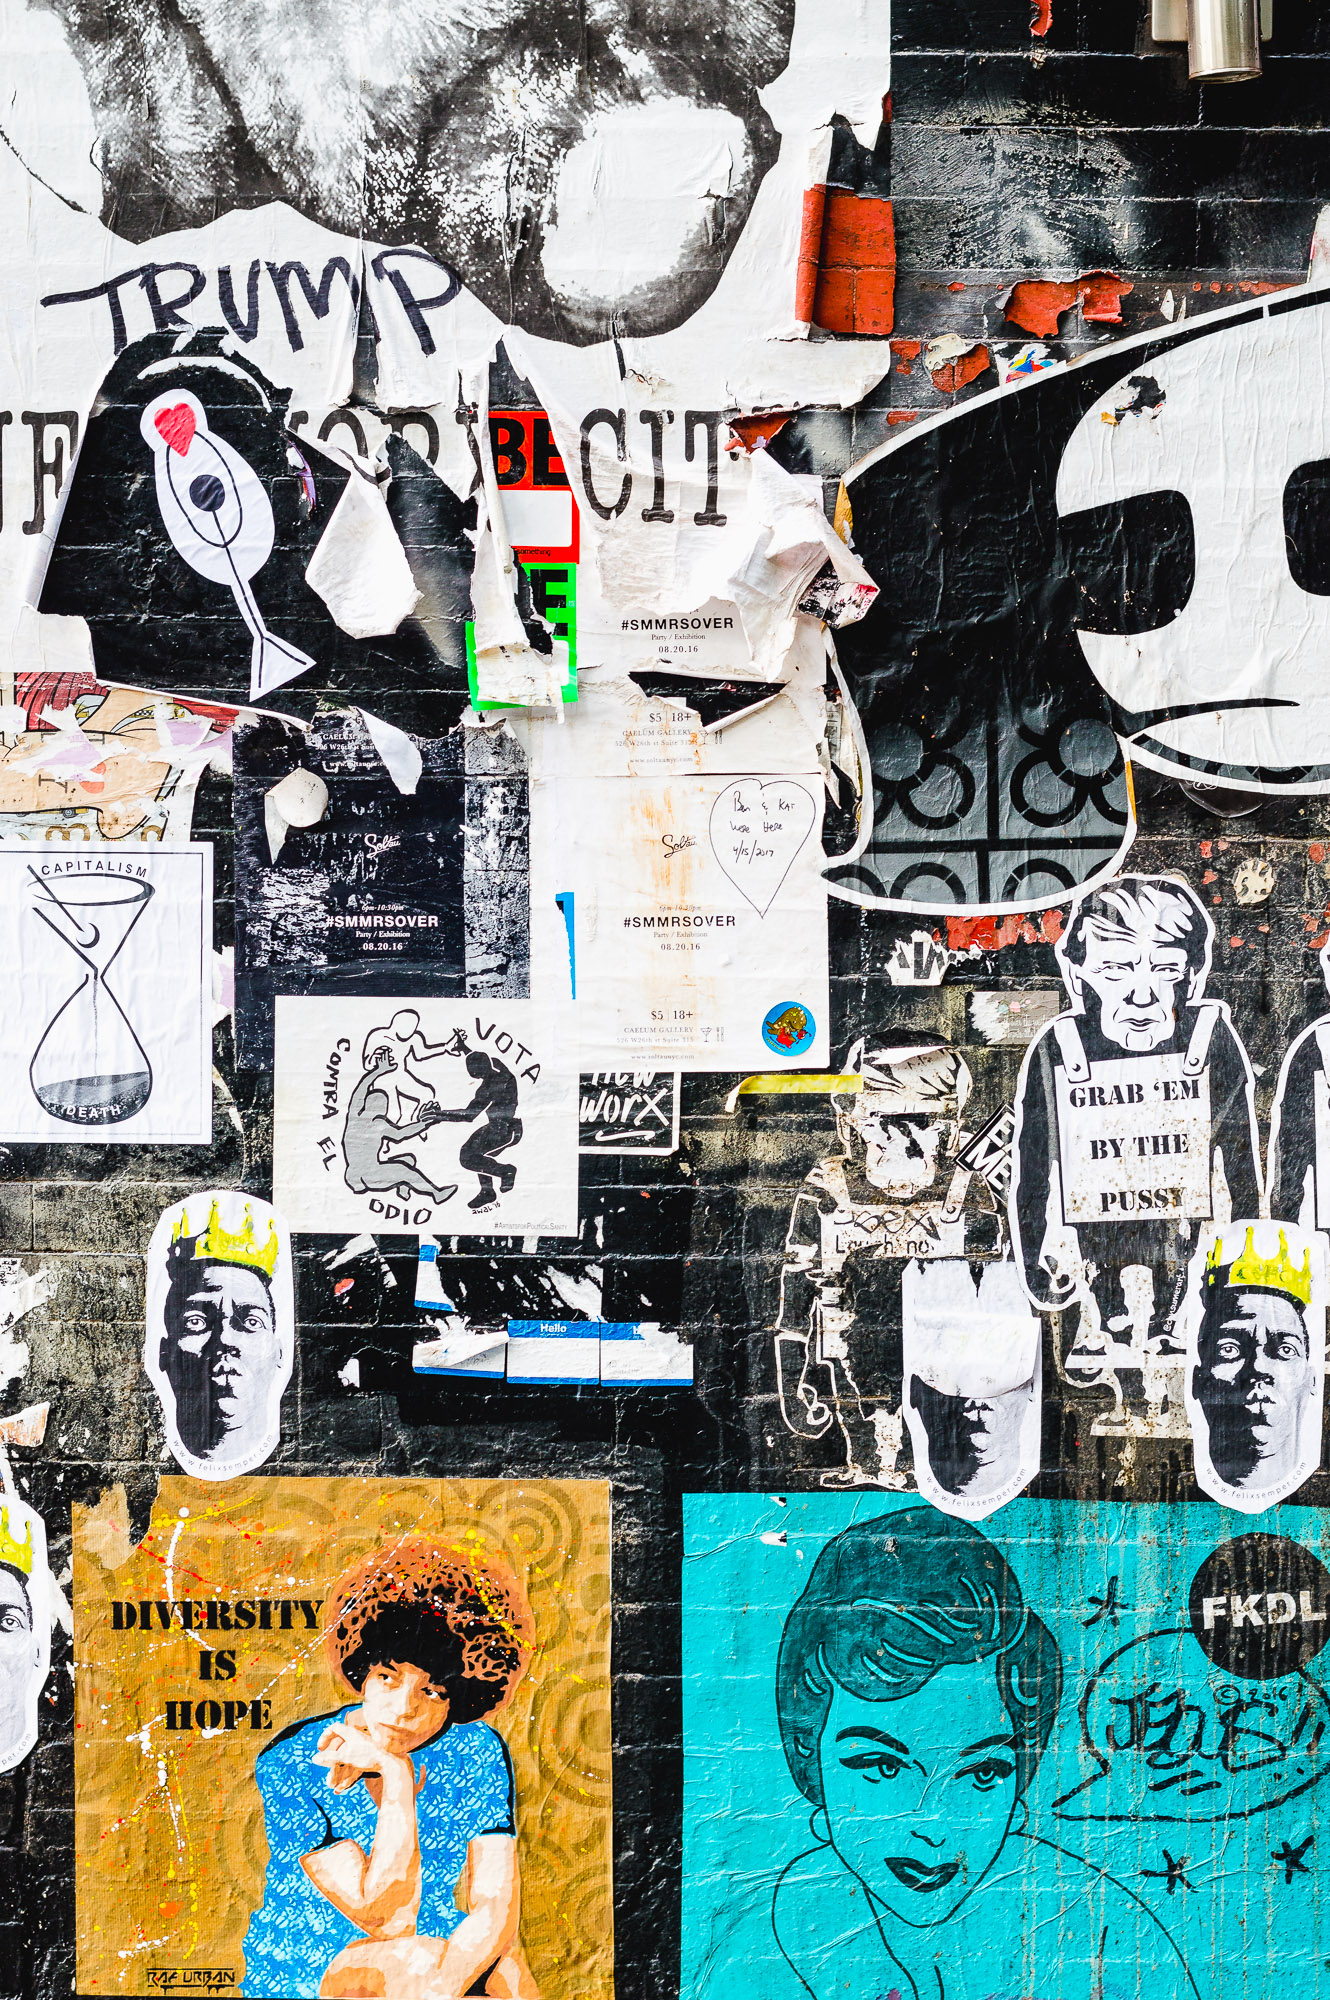 street art graffiti chelsea manhattan nyc